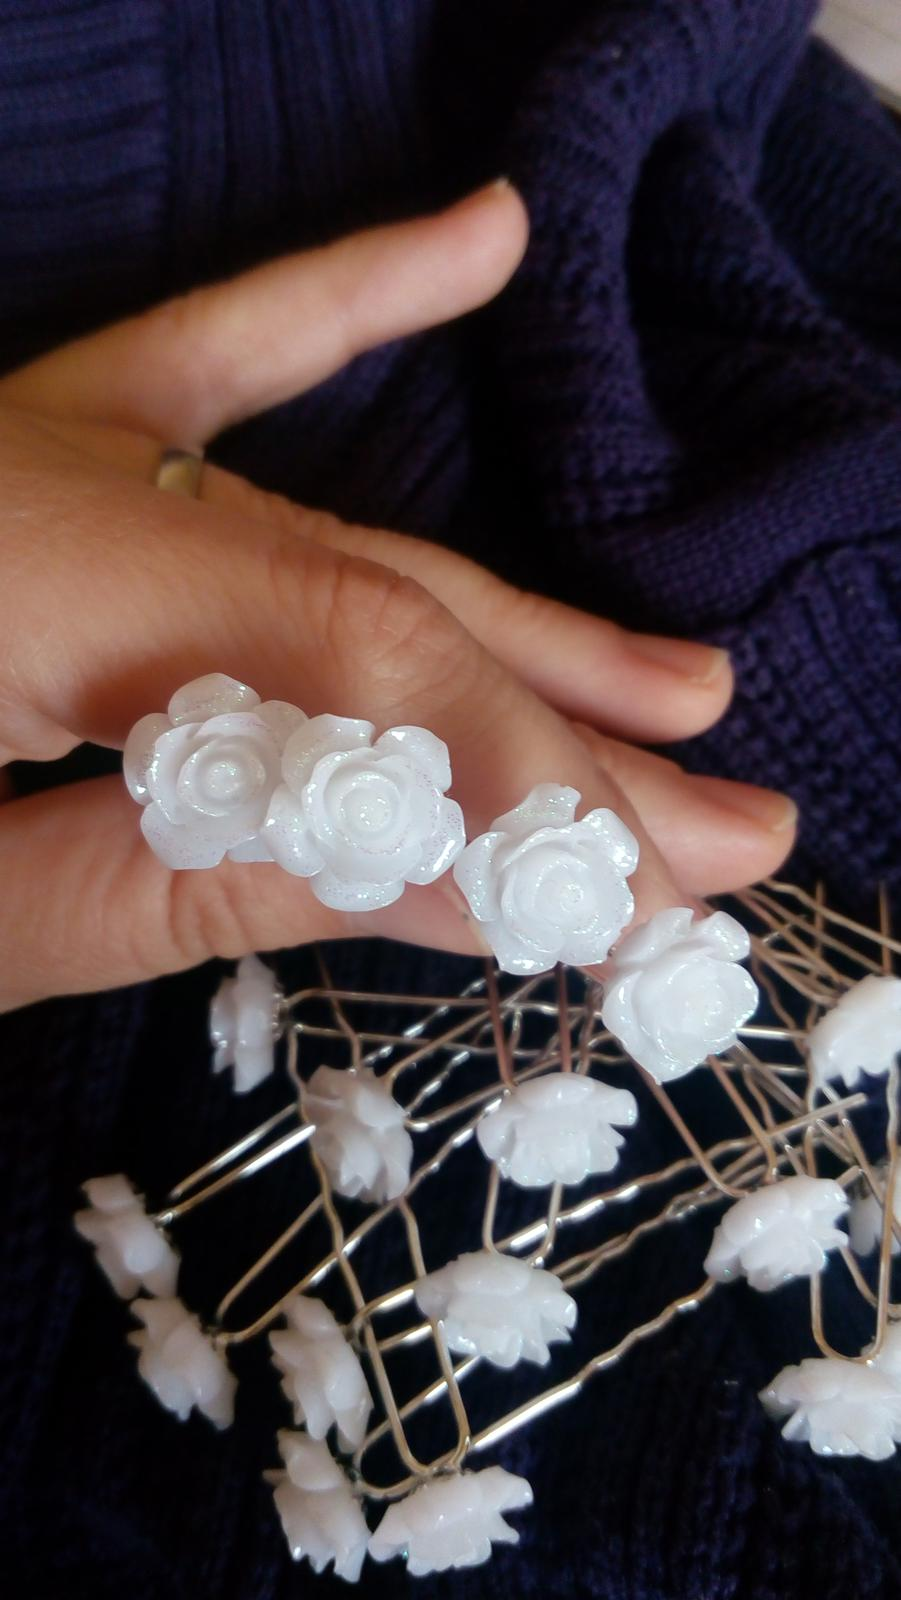 vlásenky bíly květ , sponky - Obrázek č. 2